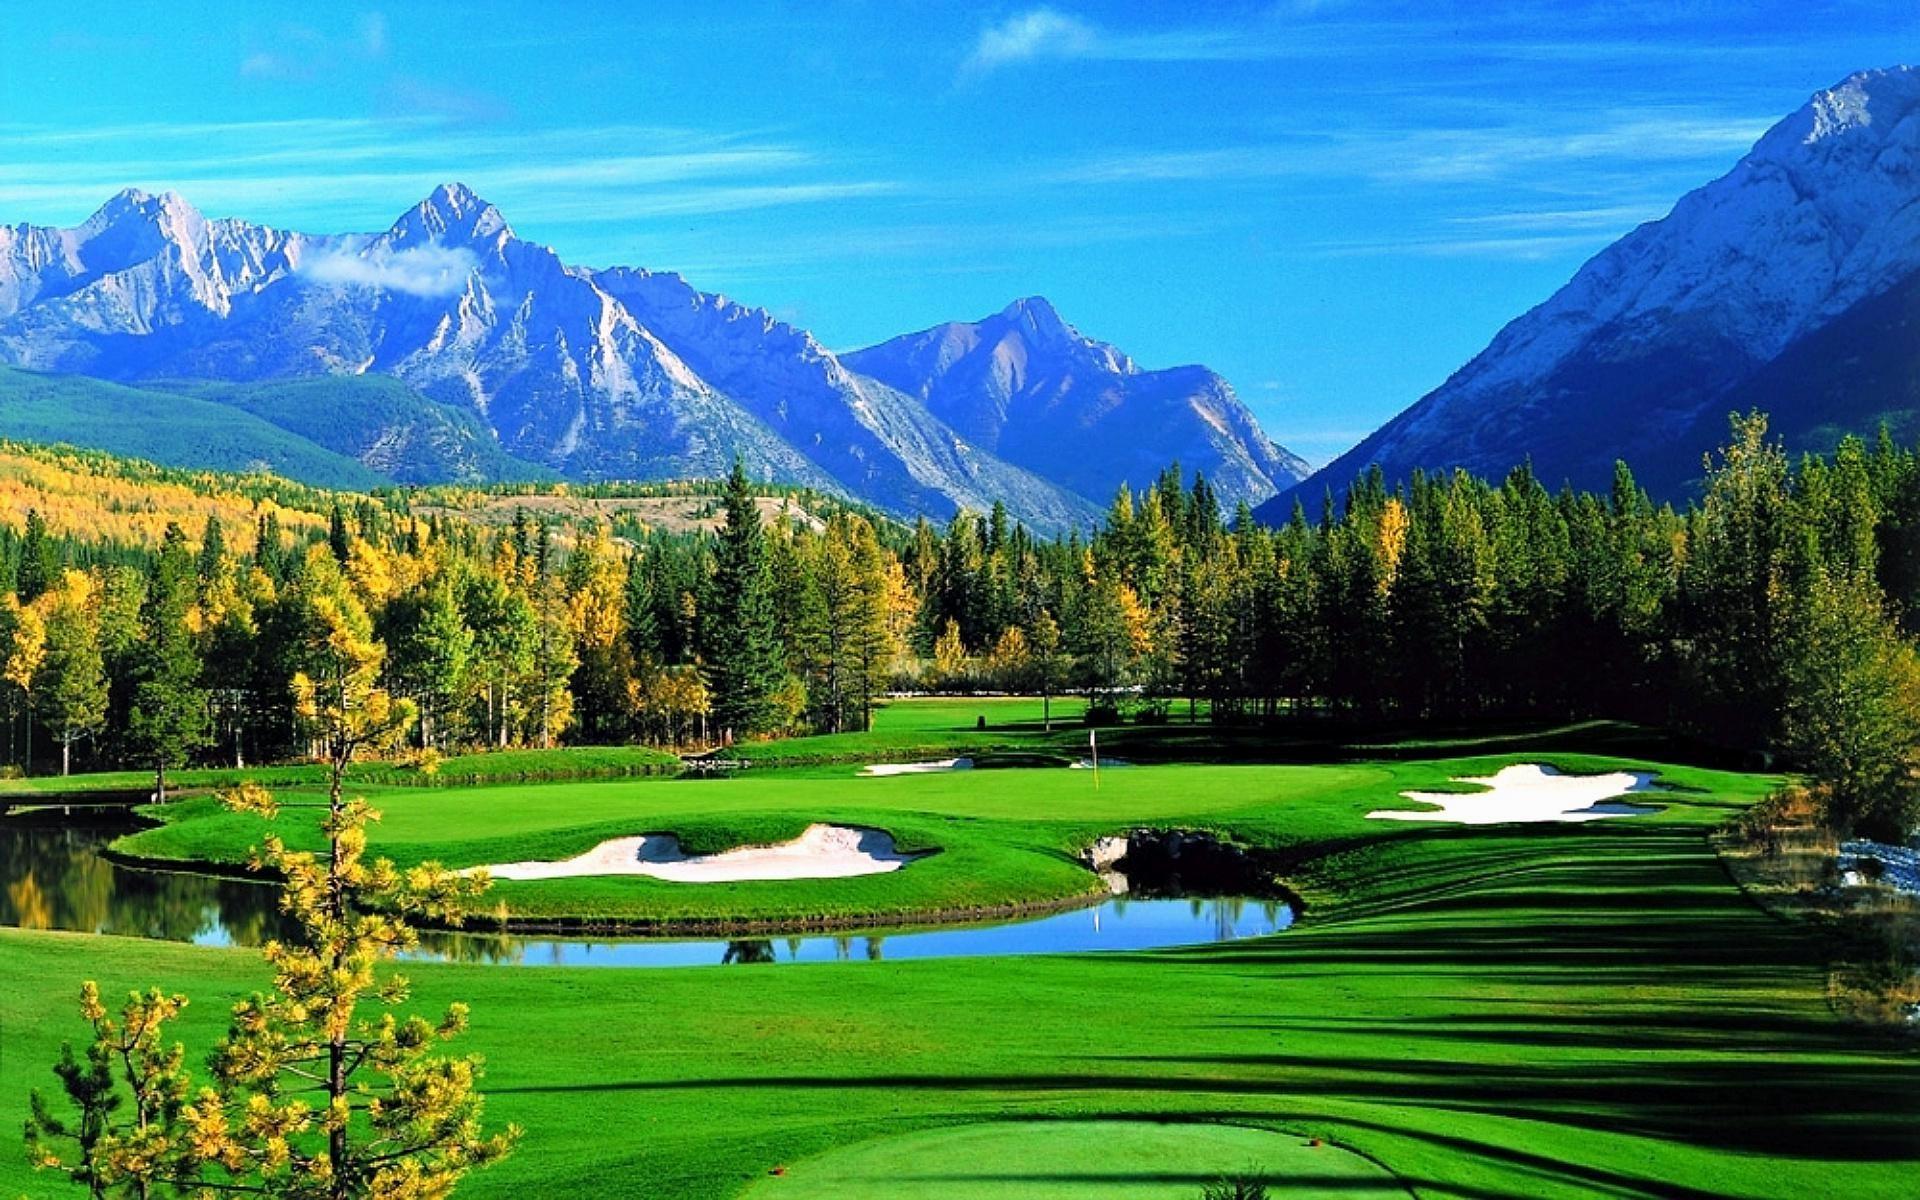 Golf-Wallpaper-Backgrounds-Desktop-free